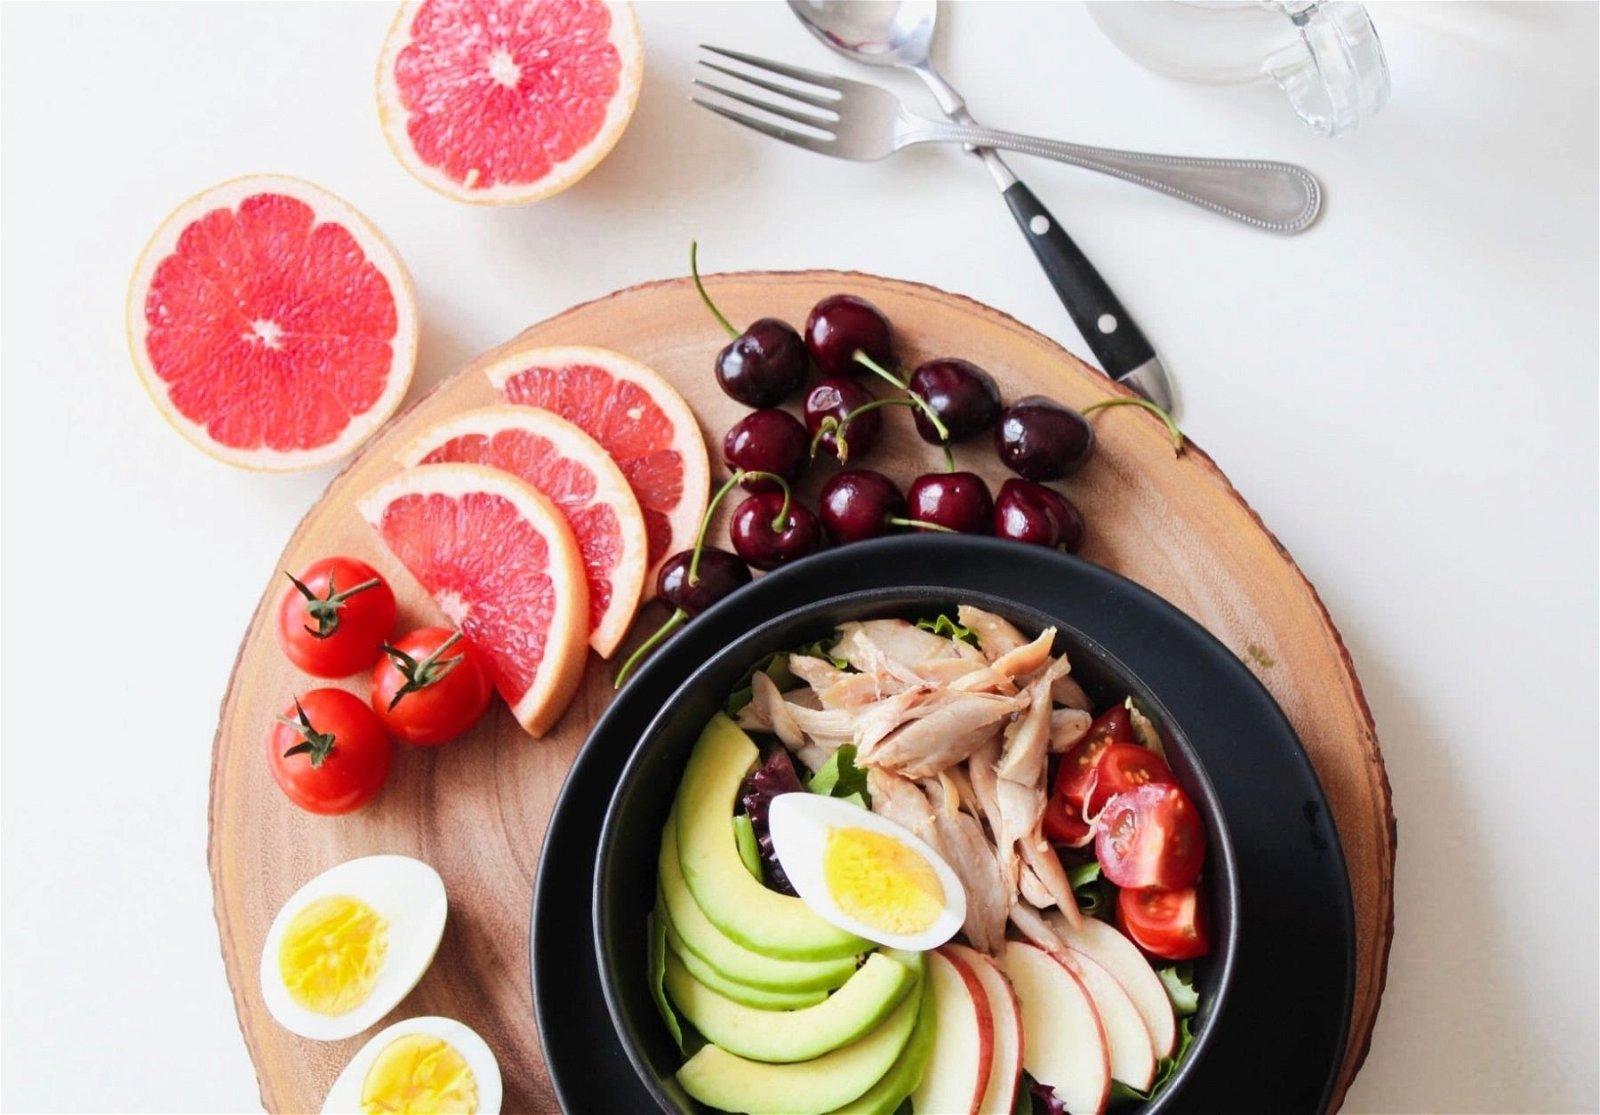 mejor dieta afinarse rapido